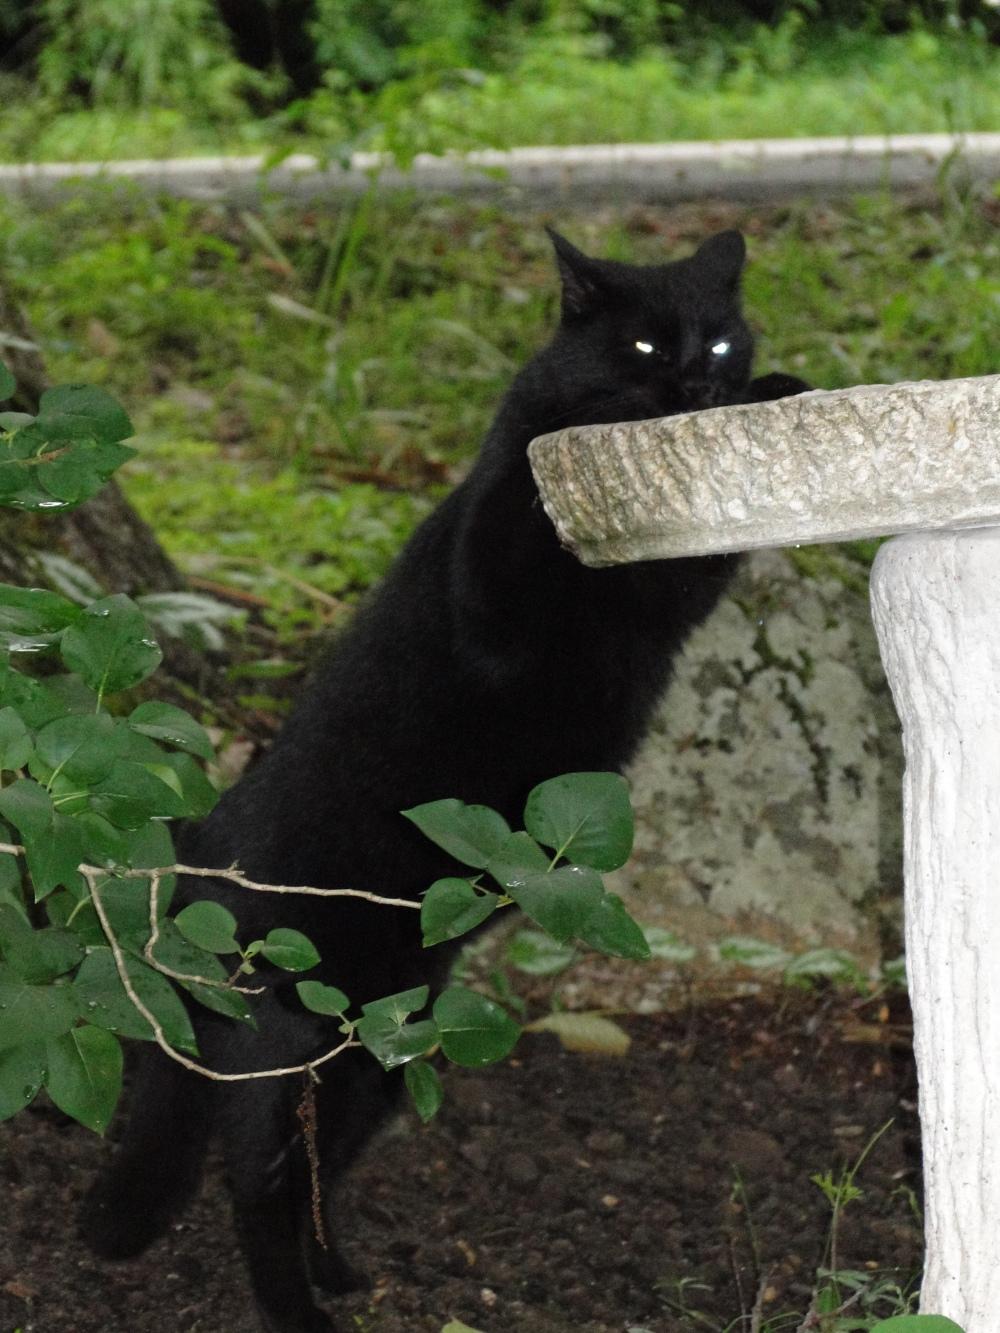 cat drinking from birdbath